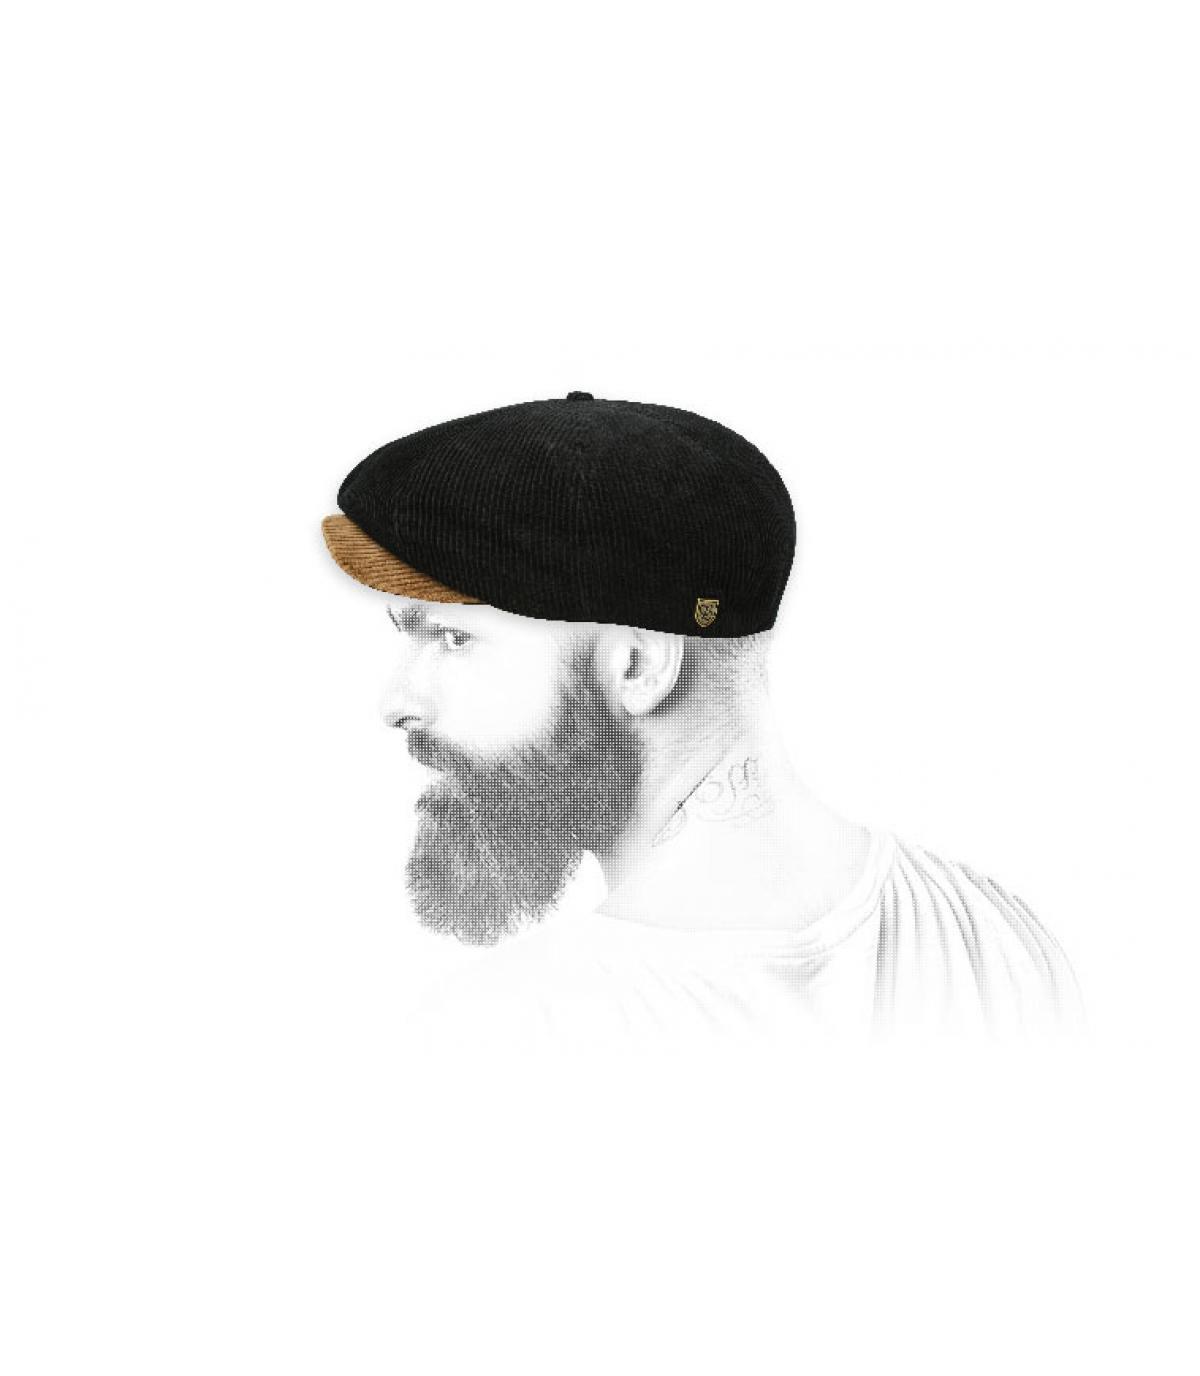 gorra repartidor negro pana